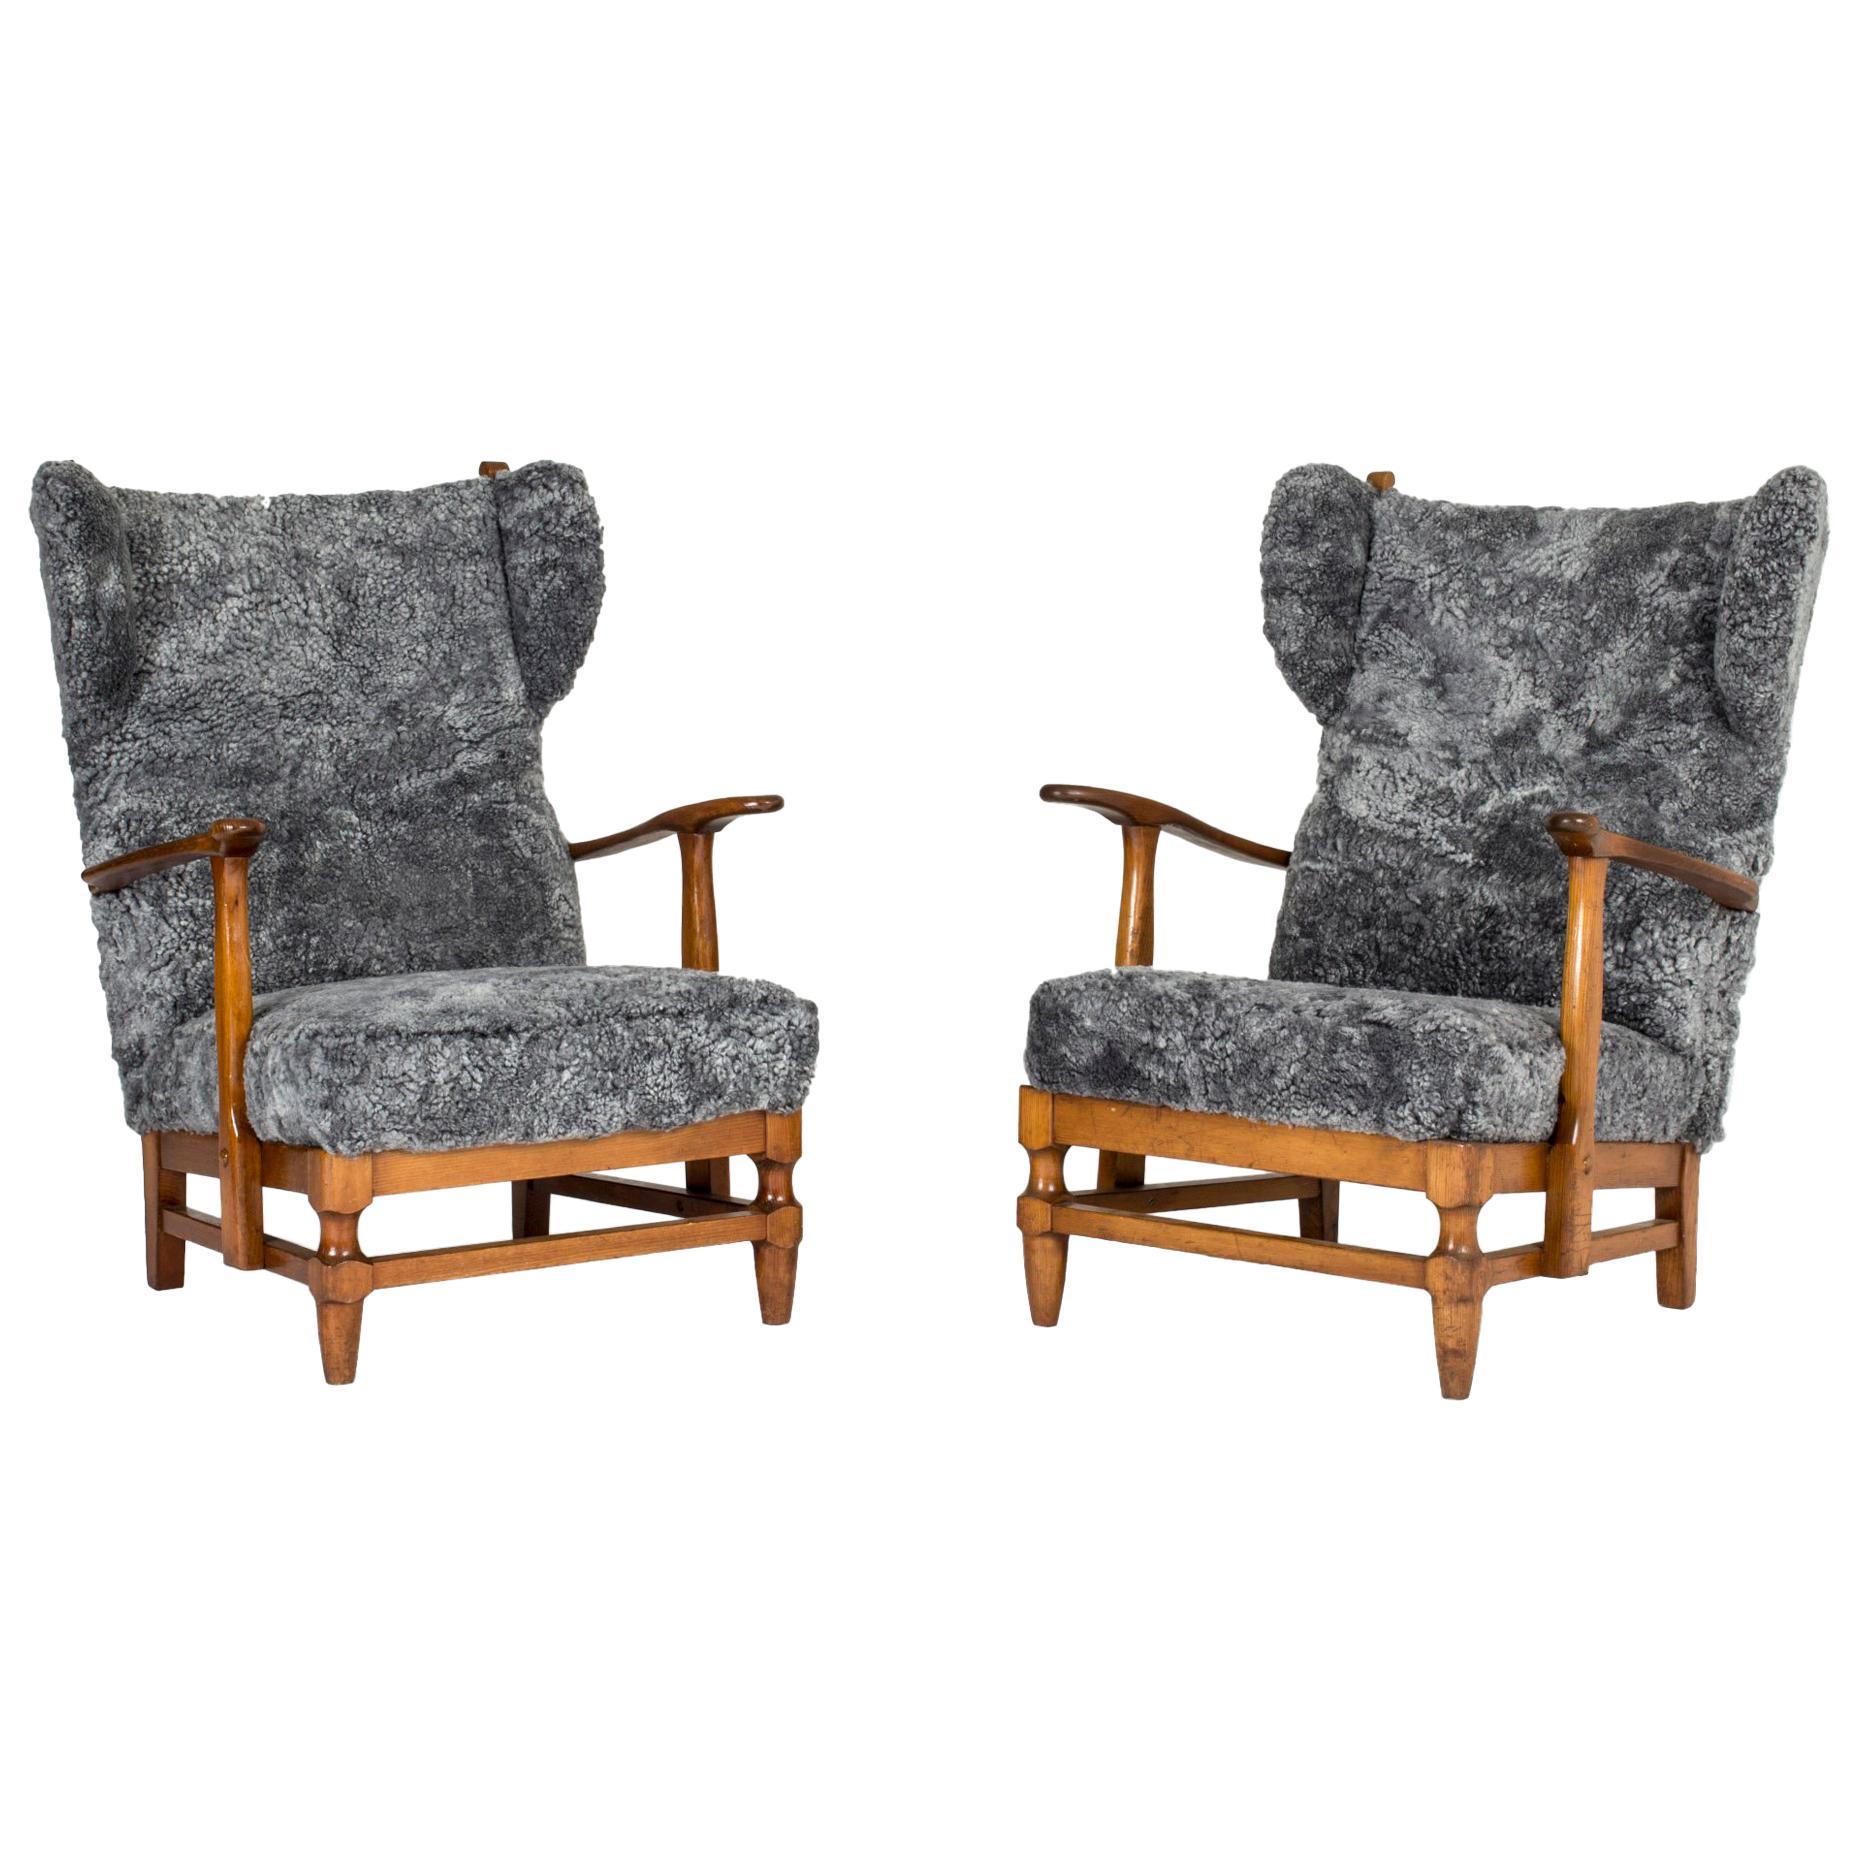 Pair of Sheepskin Lounge Chairs by Gunnar Göperts